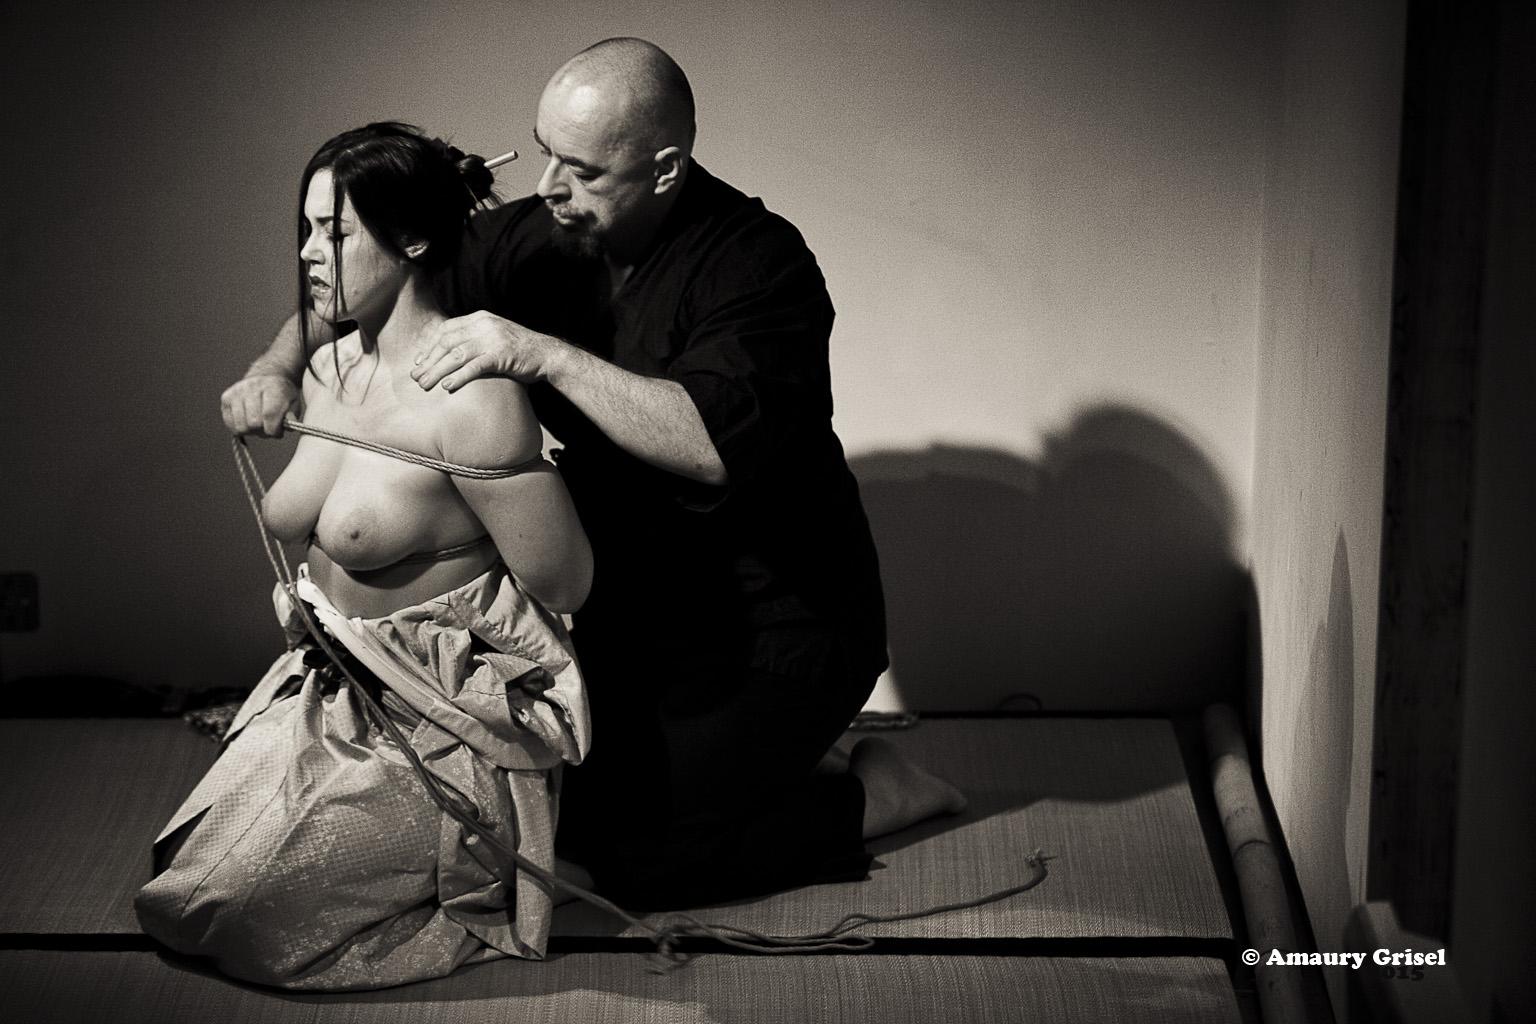 Kinbaku / Shibari Show In Paris France 2015 With Wykd Dave And Clover Brook